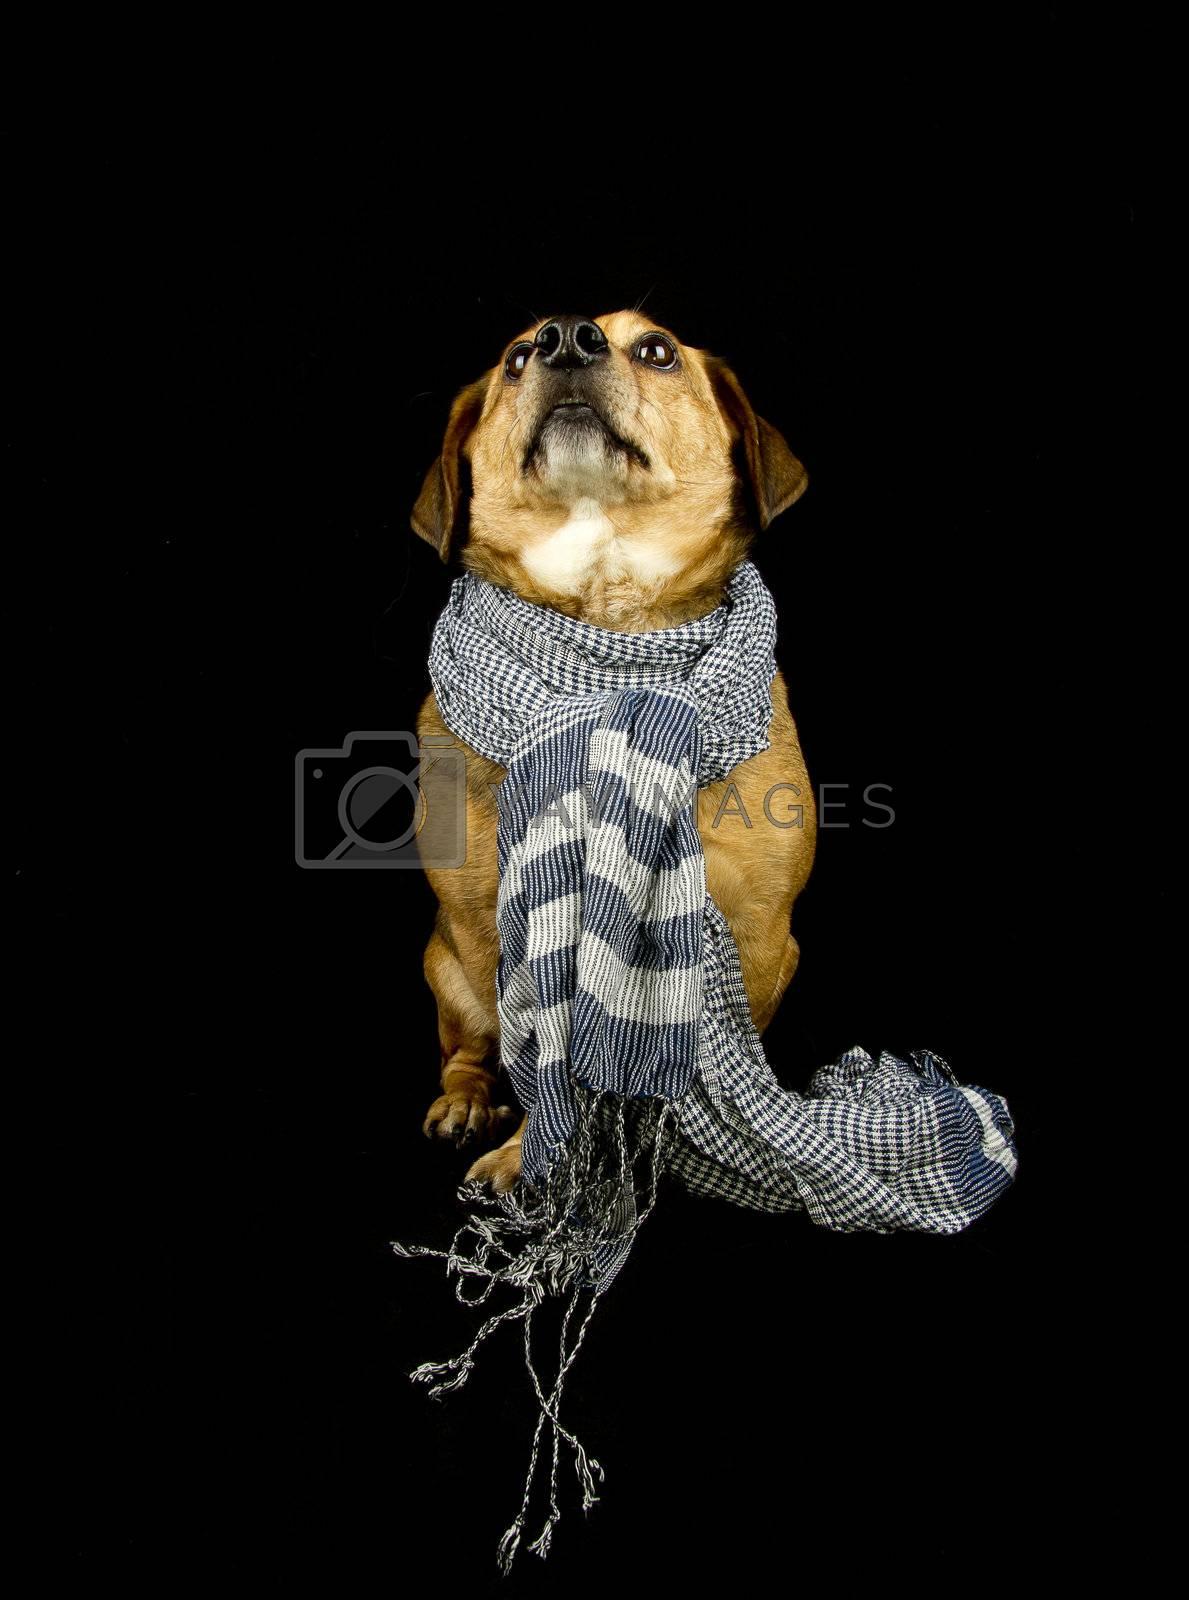 a little dachshund dog with scarf